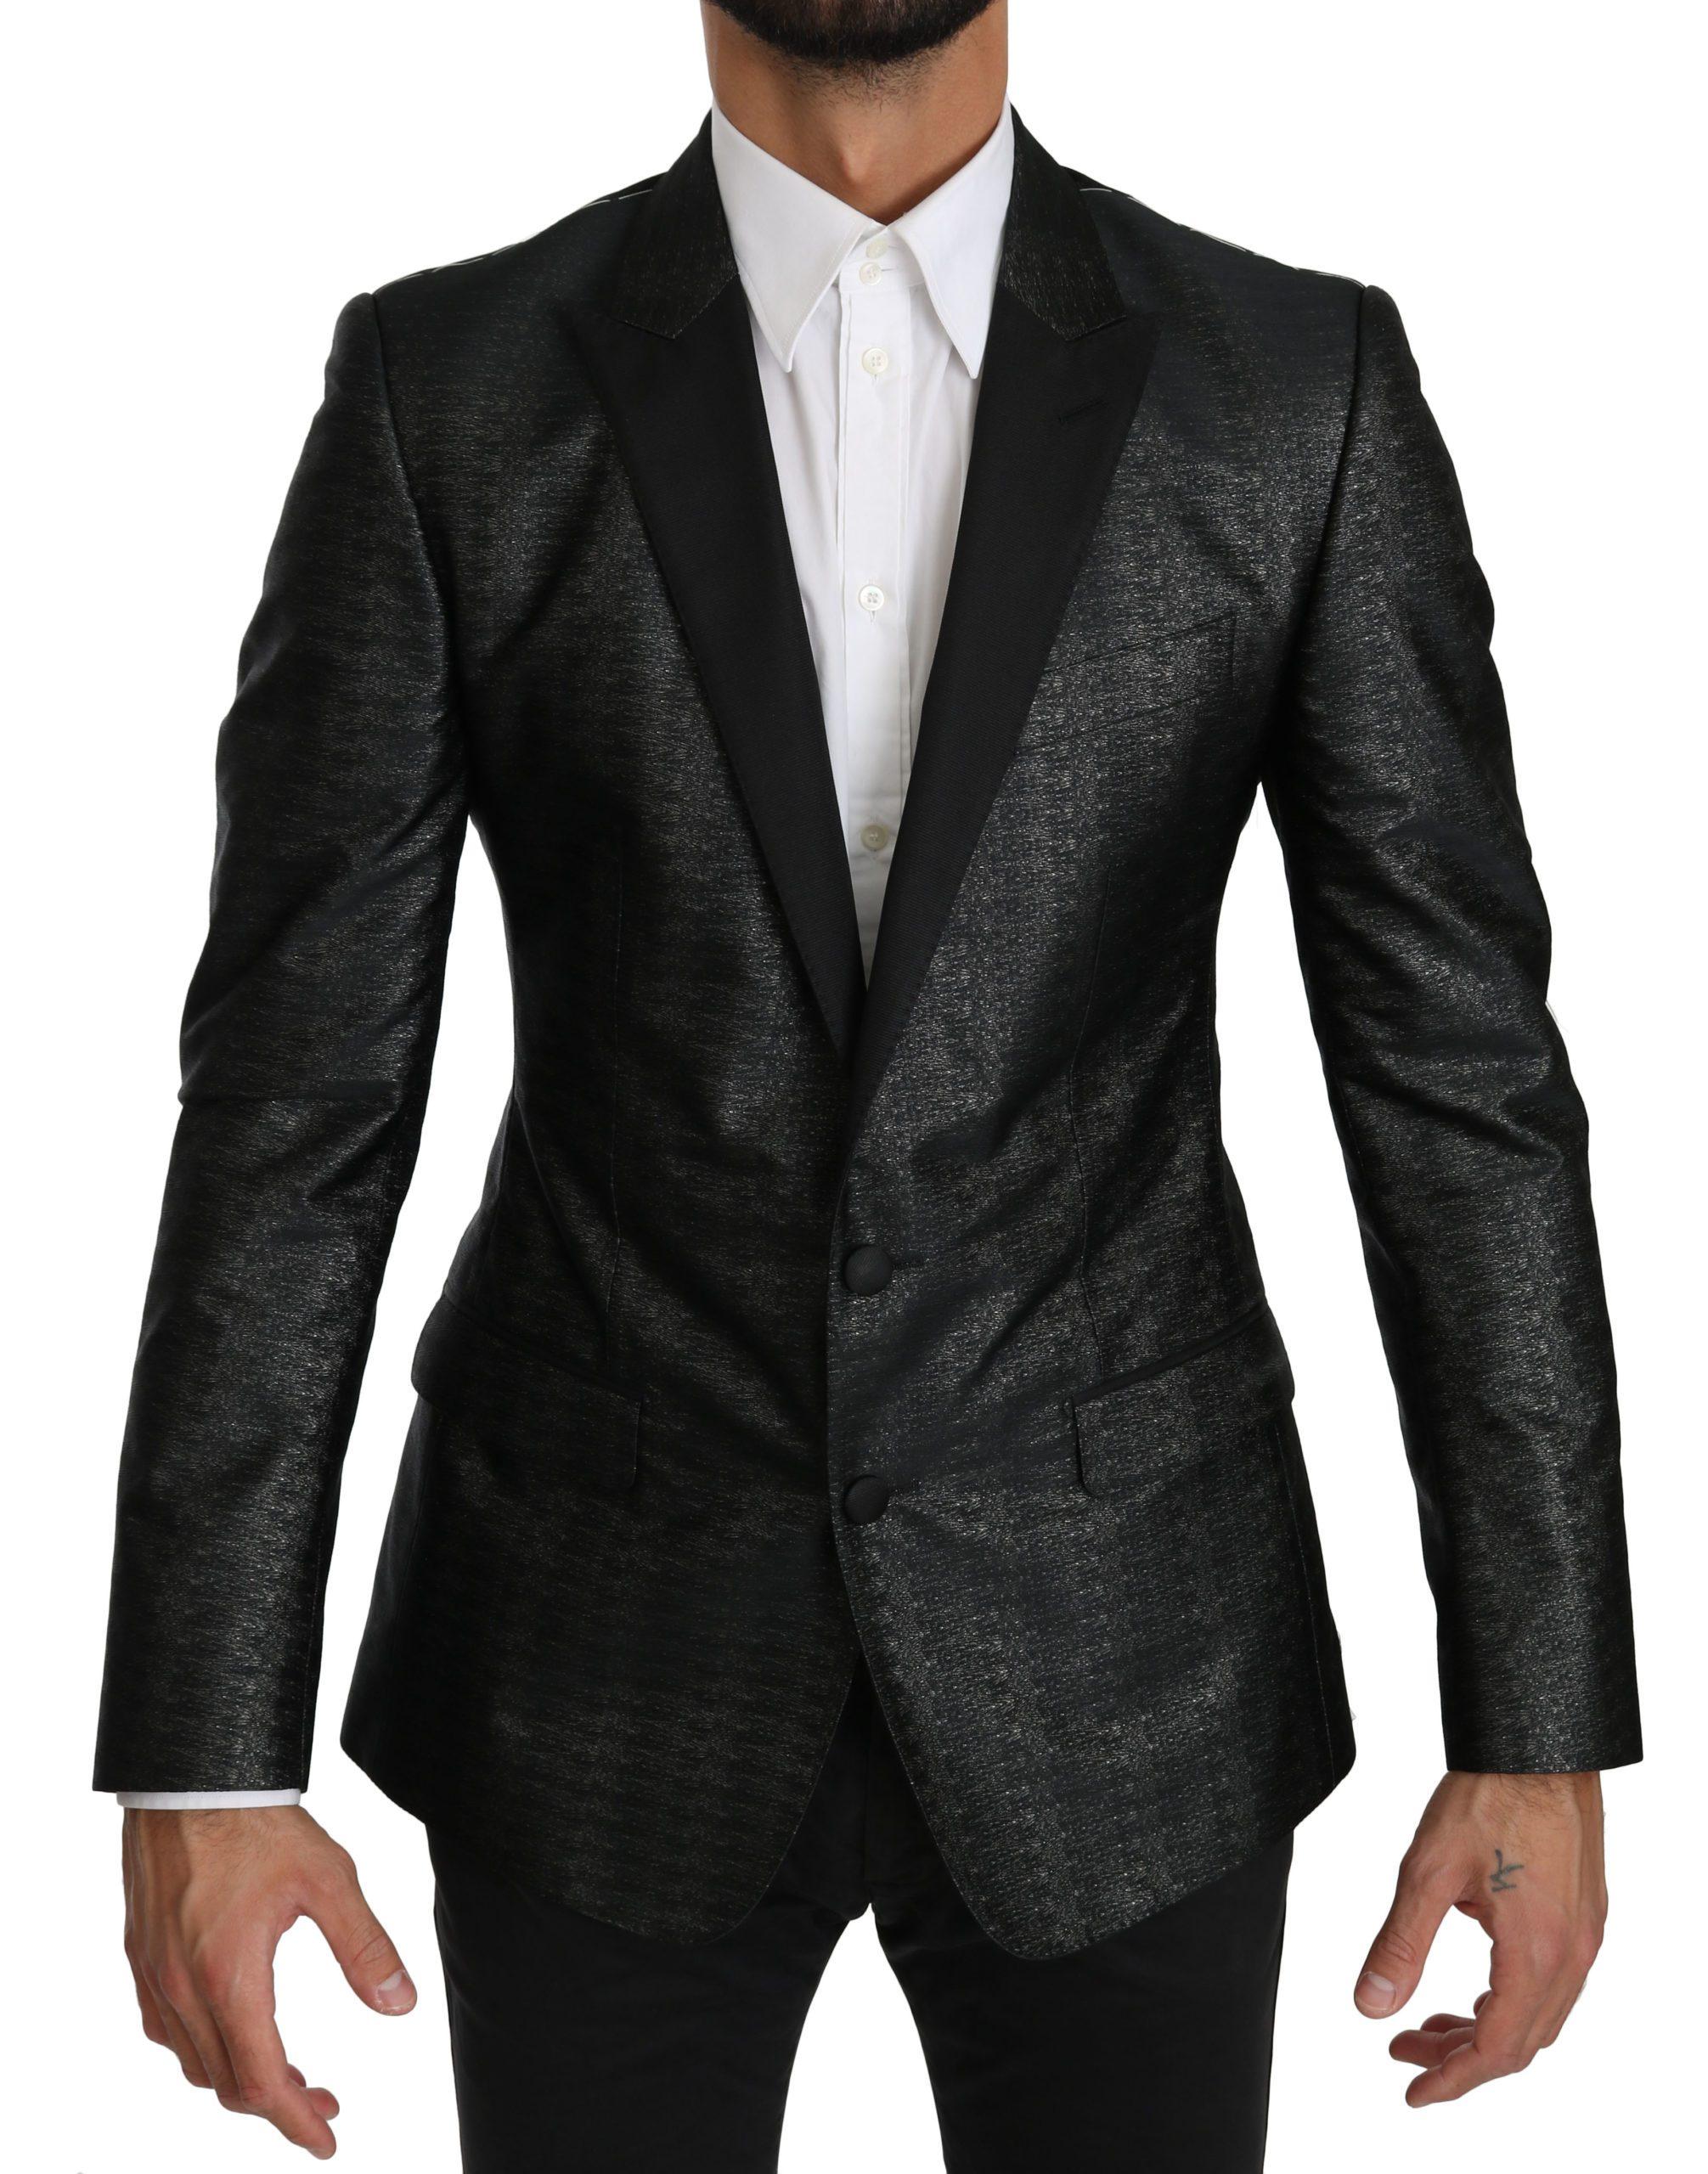 Dolce & Gabbana Men's Slim Fit MARTINI Blazer Black KOS1545 - IT48 | M